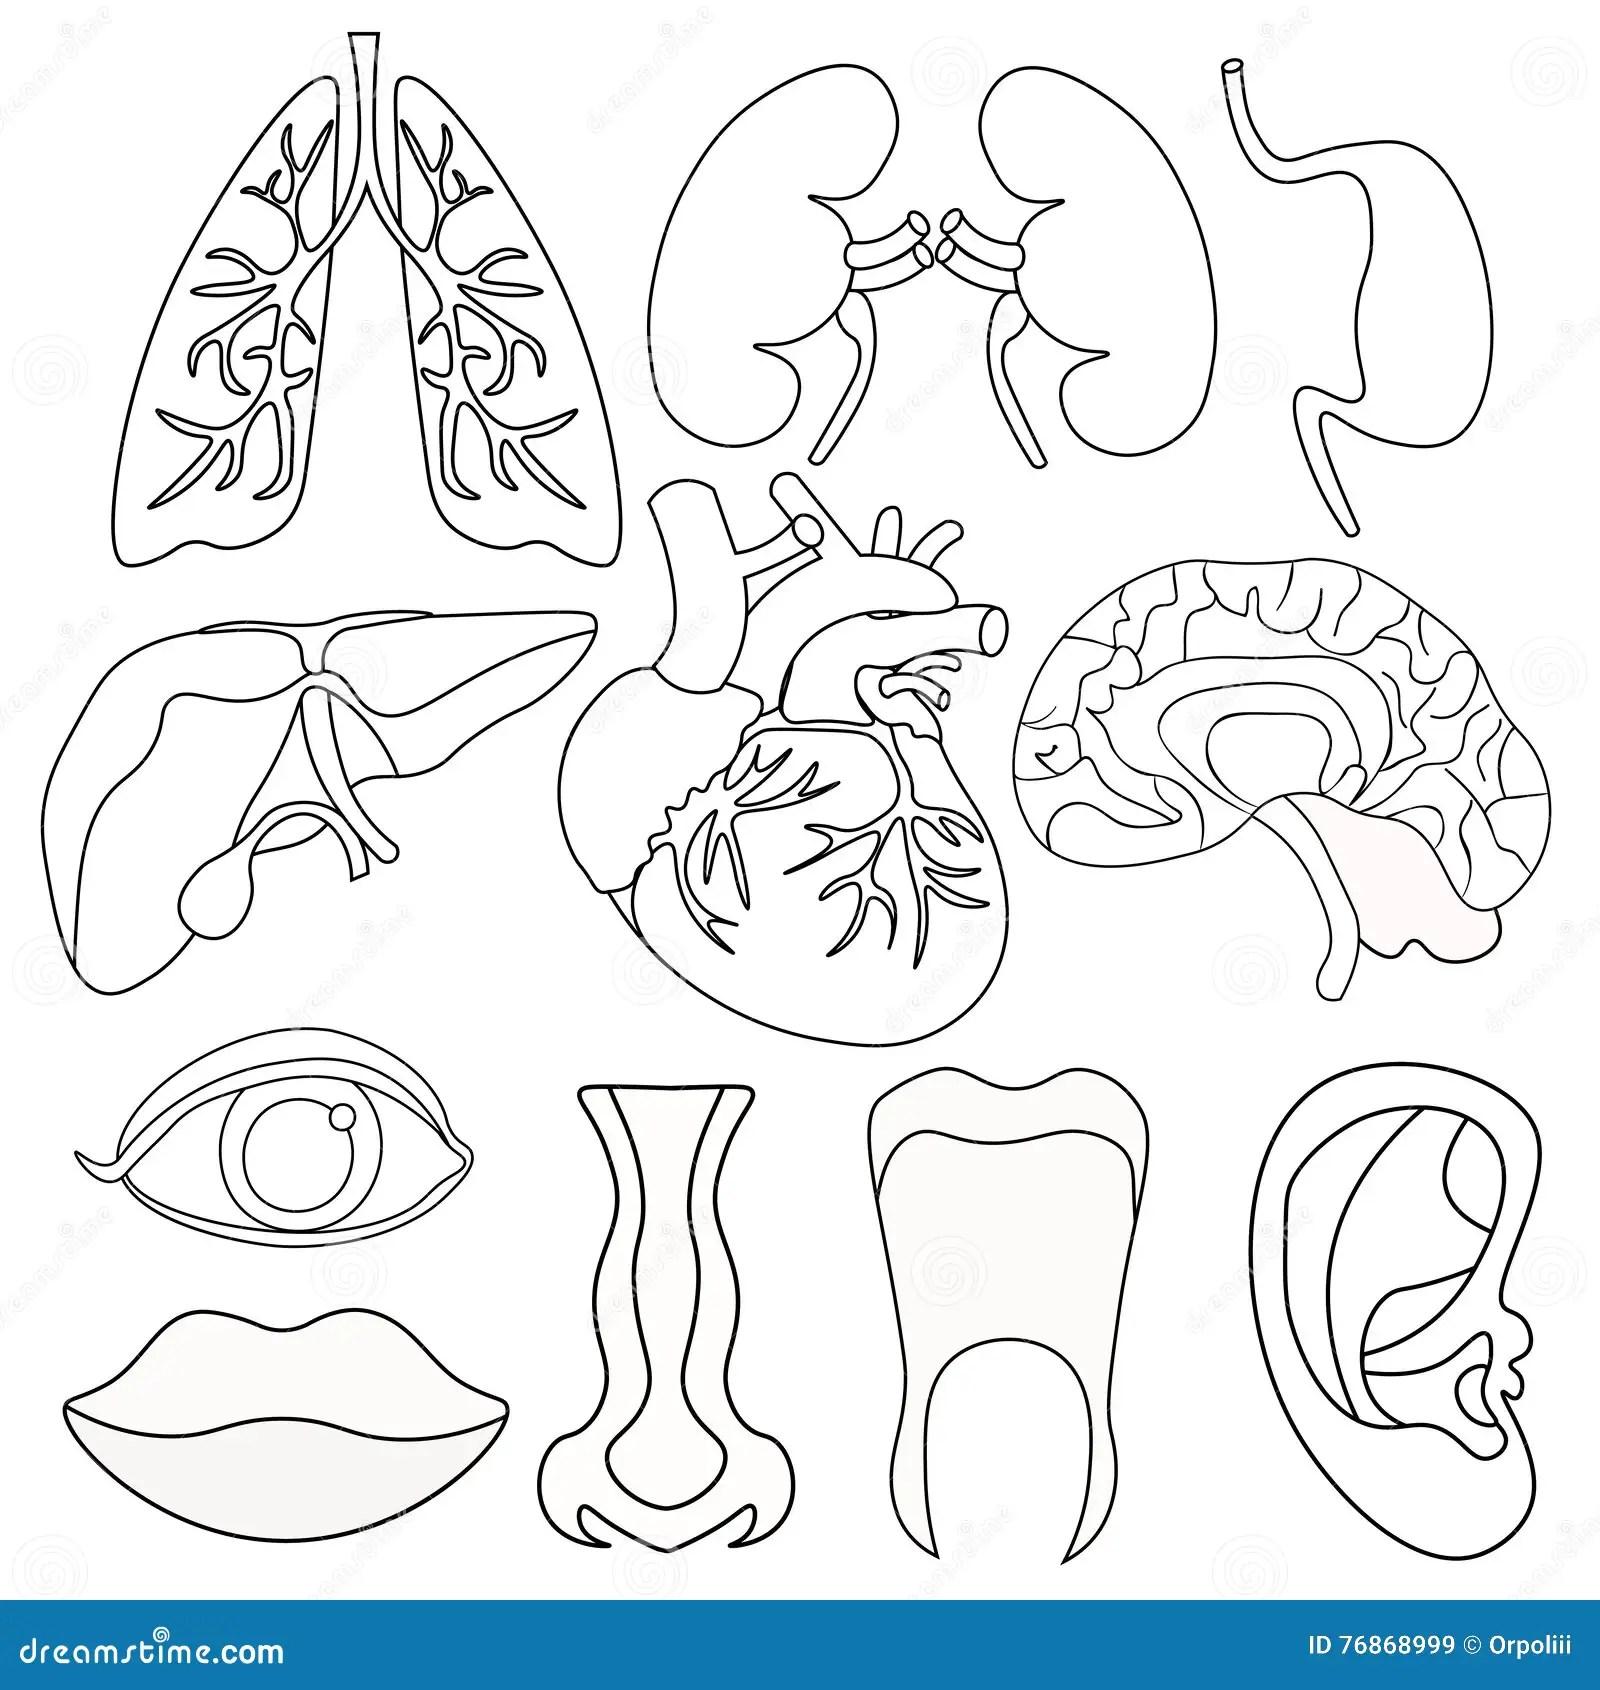 Human Body Organs Worksheets Sketch Coloring Page